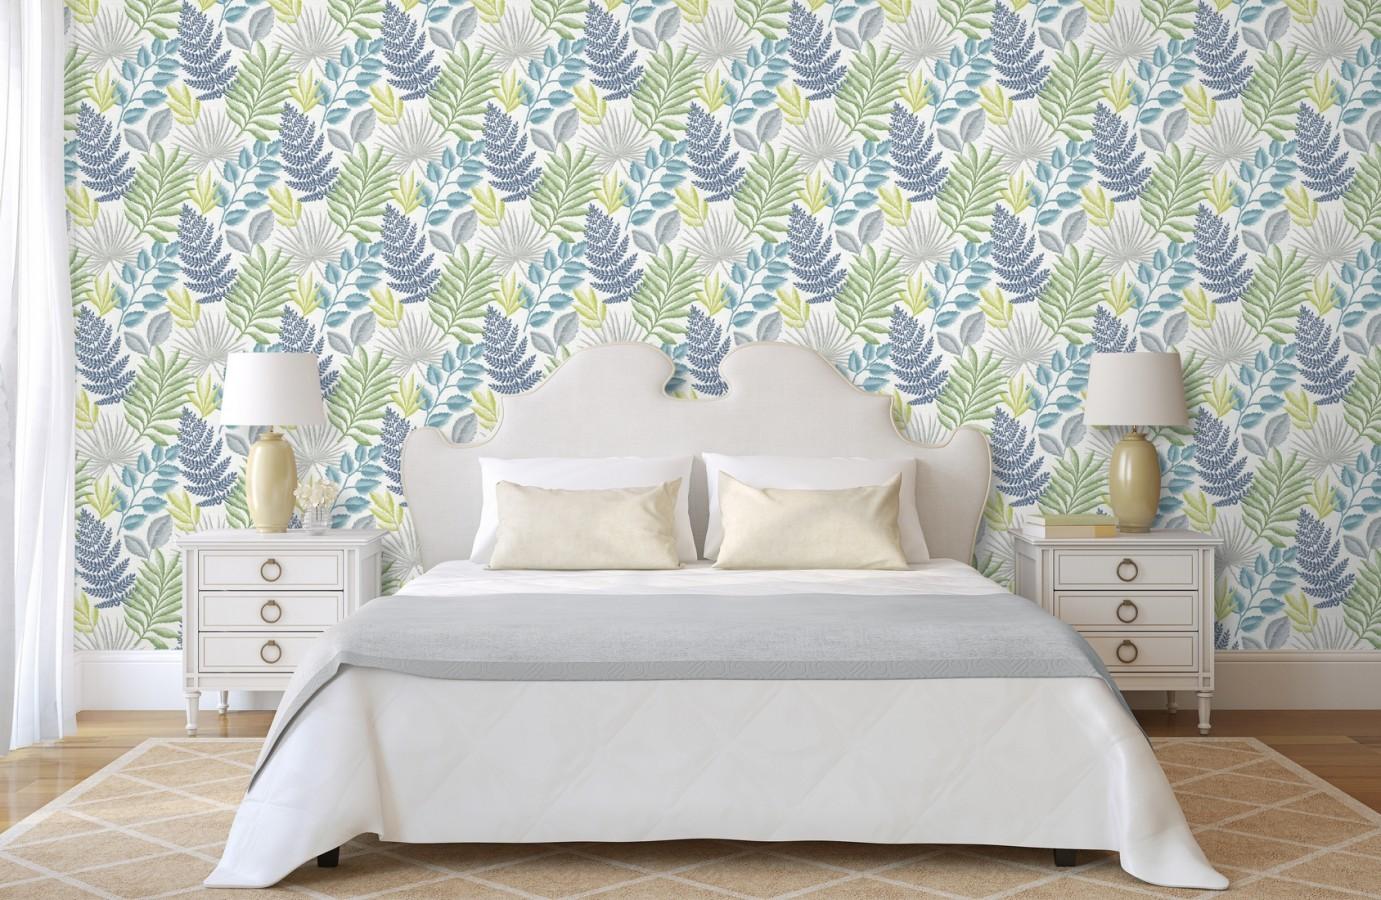 Papel pintado hojas silvestres estilo tropical Acapulco 679569